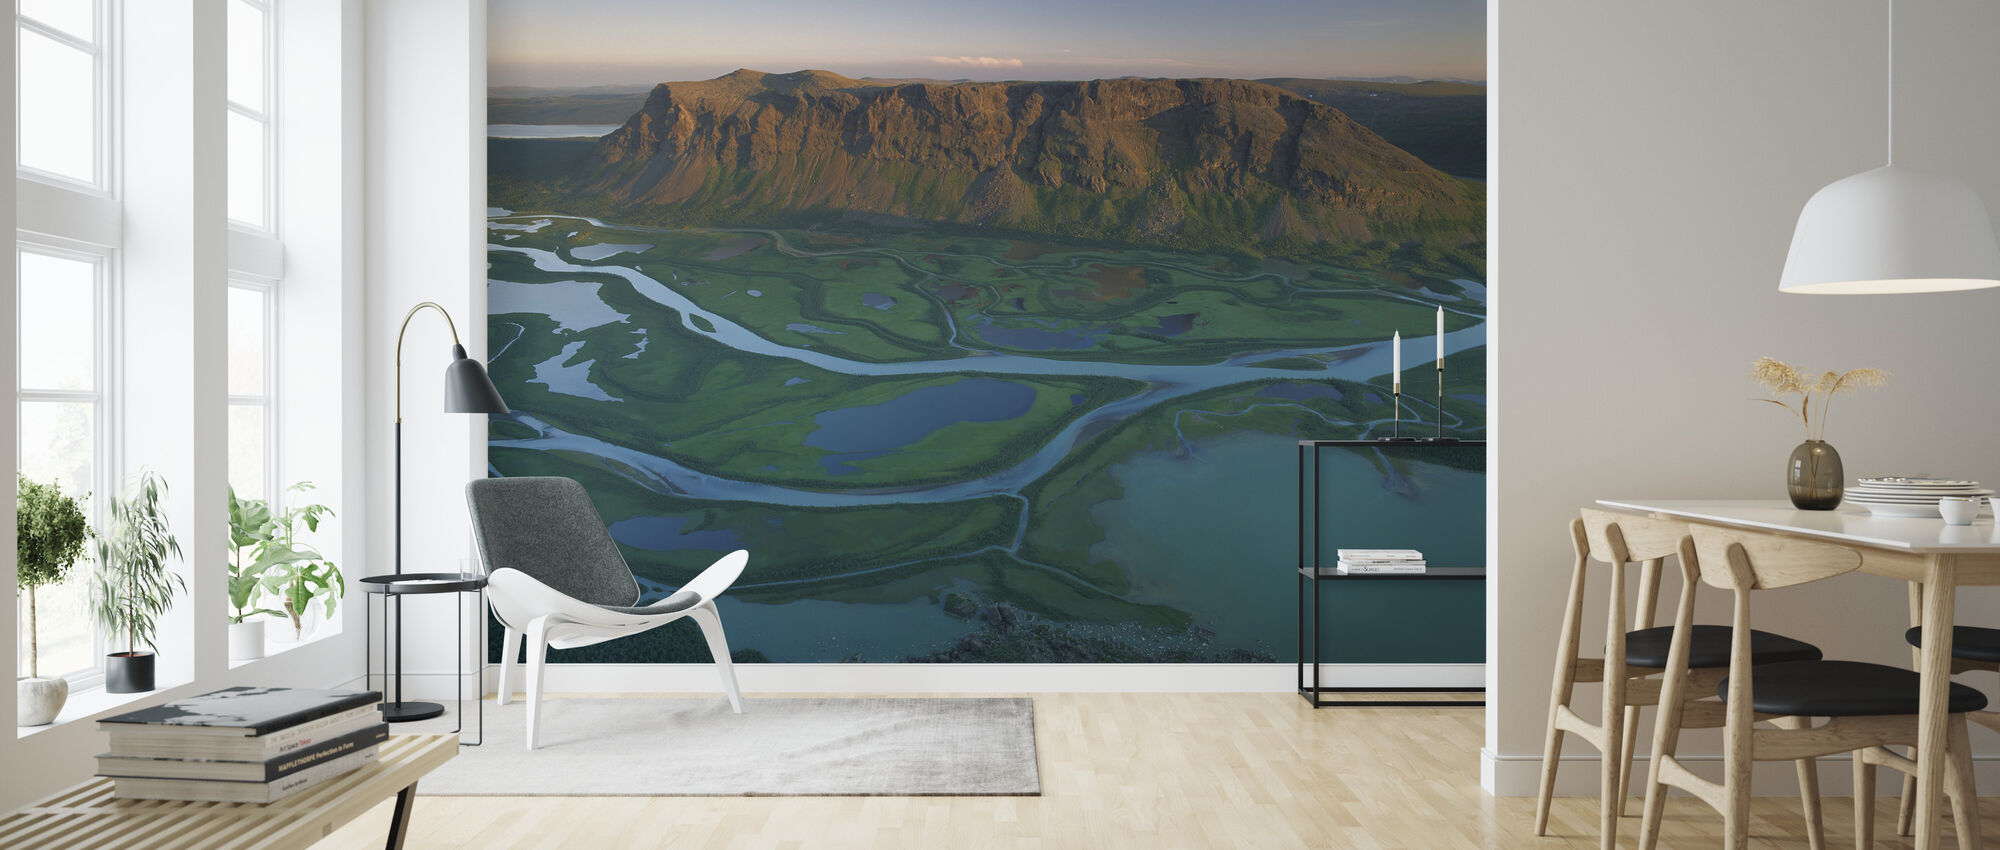 River Delta in Sarek National Park, Sweden - Wallpaper - Living Room